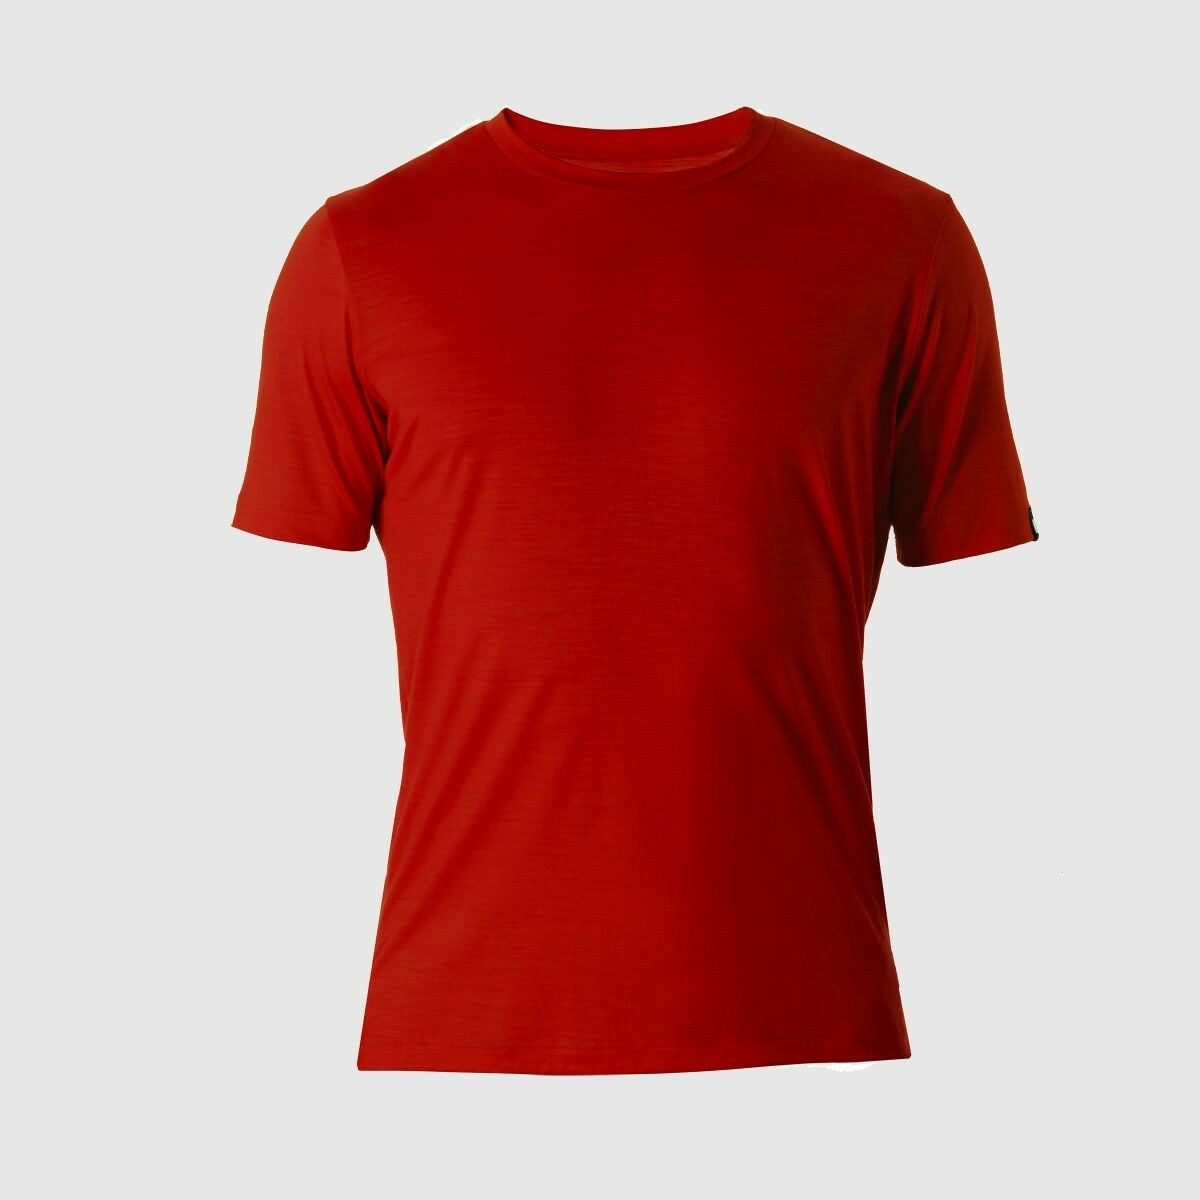 rotA Rewoolution Trick   Mens T Shirt Short Sleeve  flame  Merinowolle  Gr. XXL